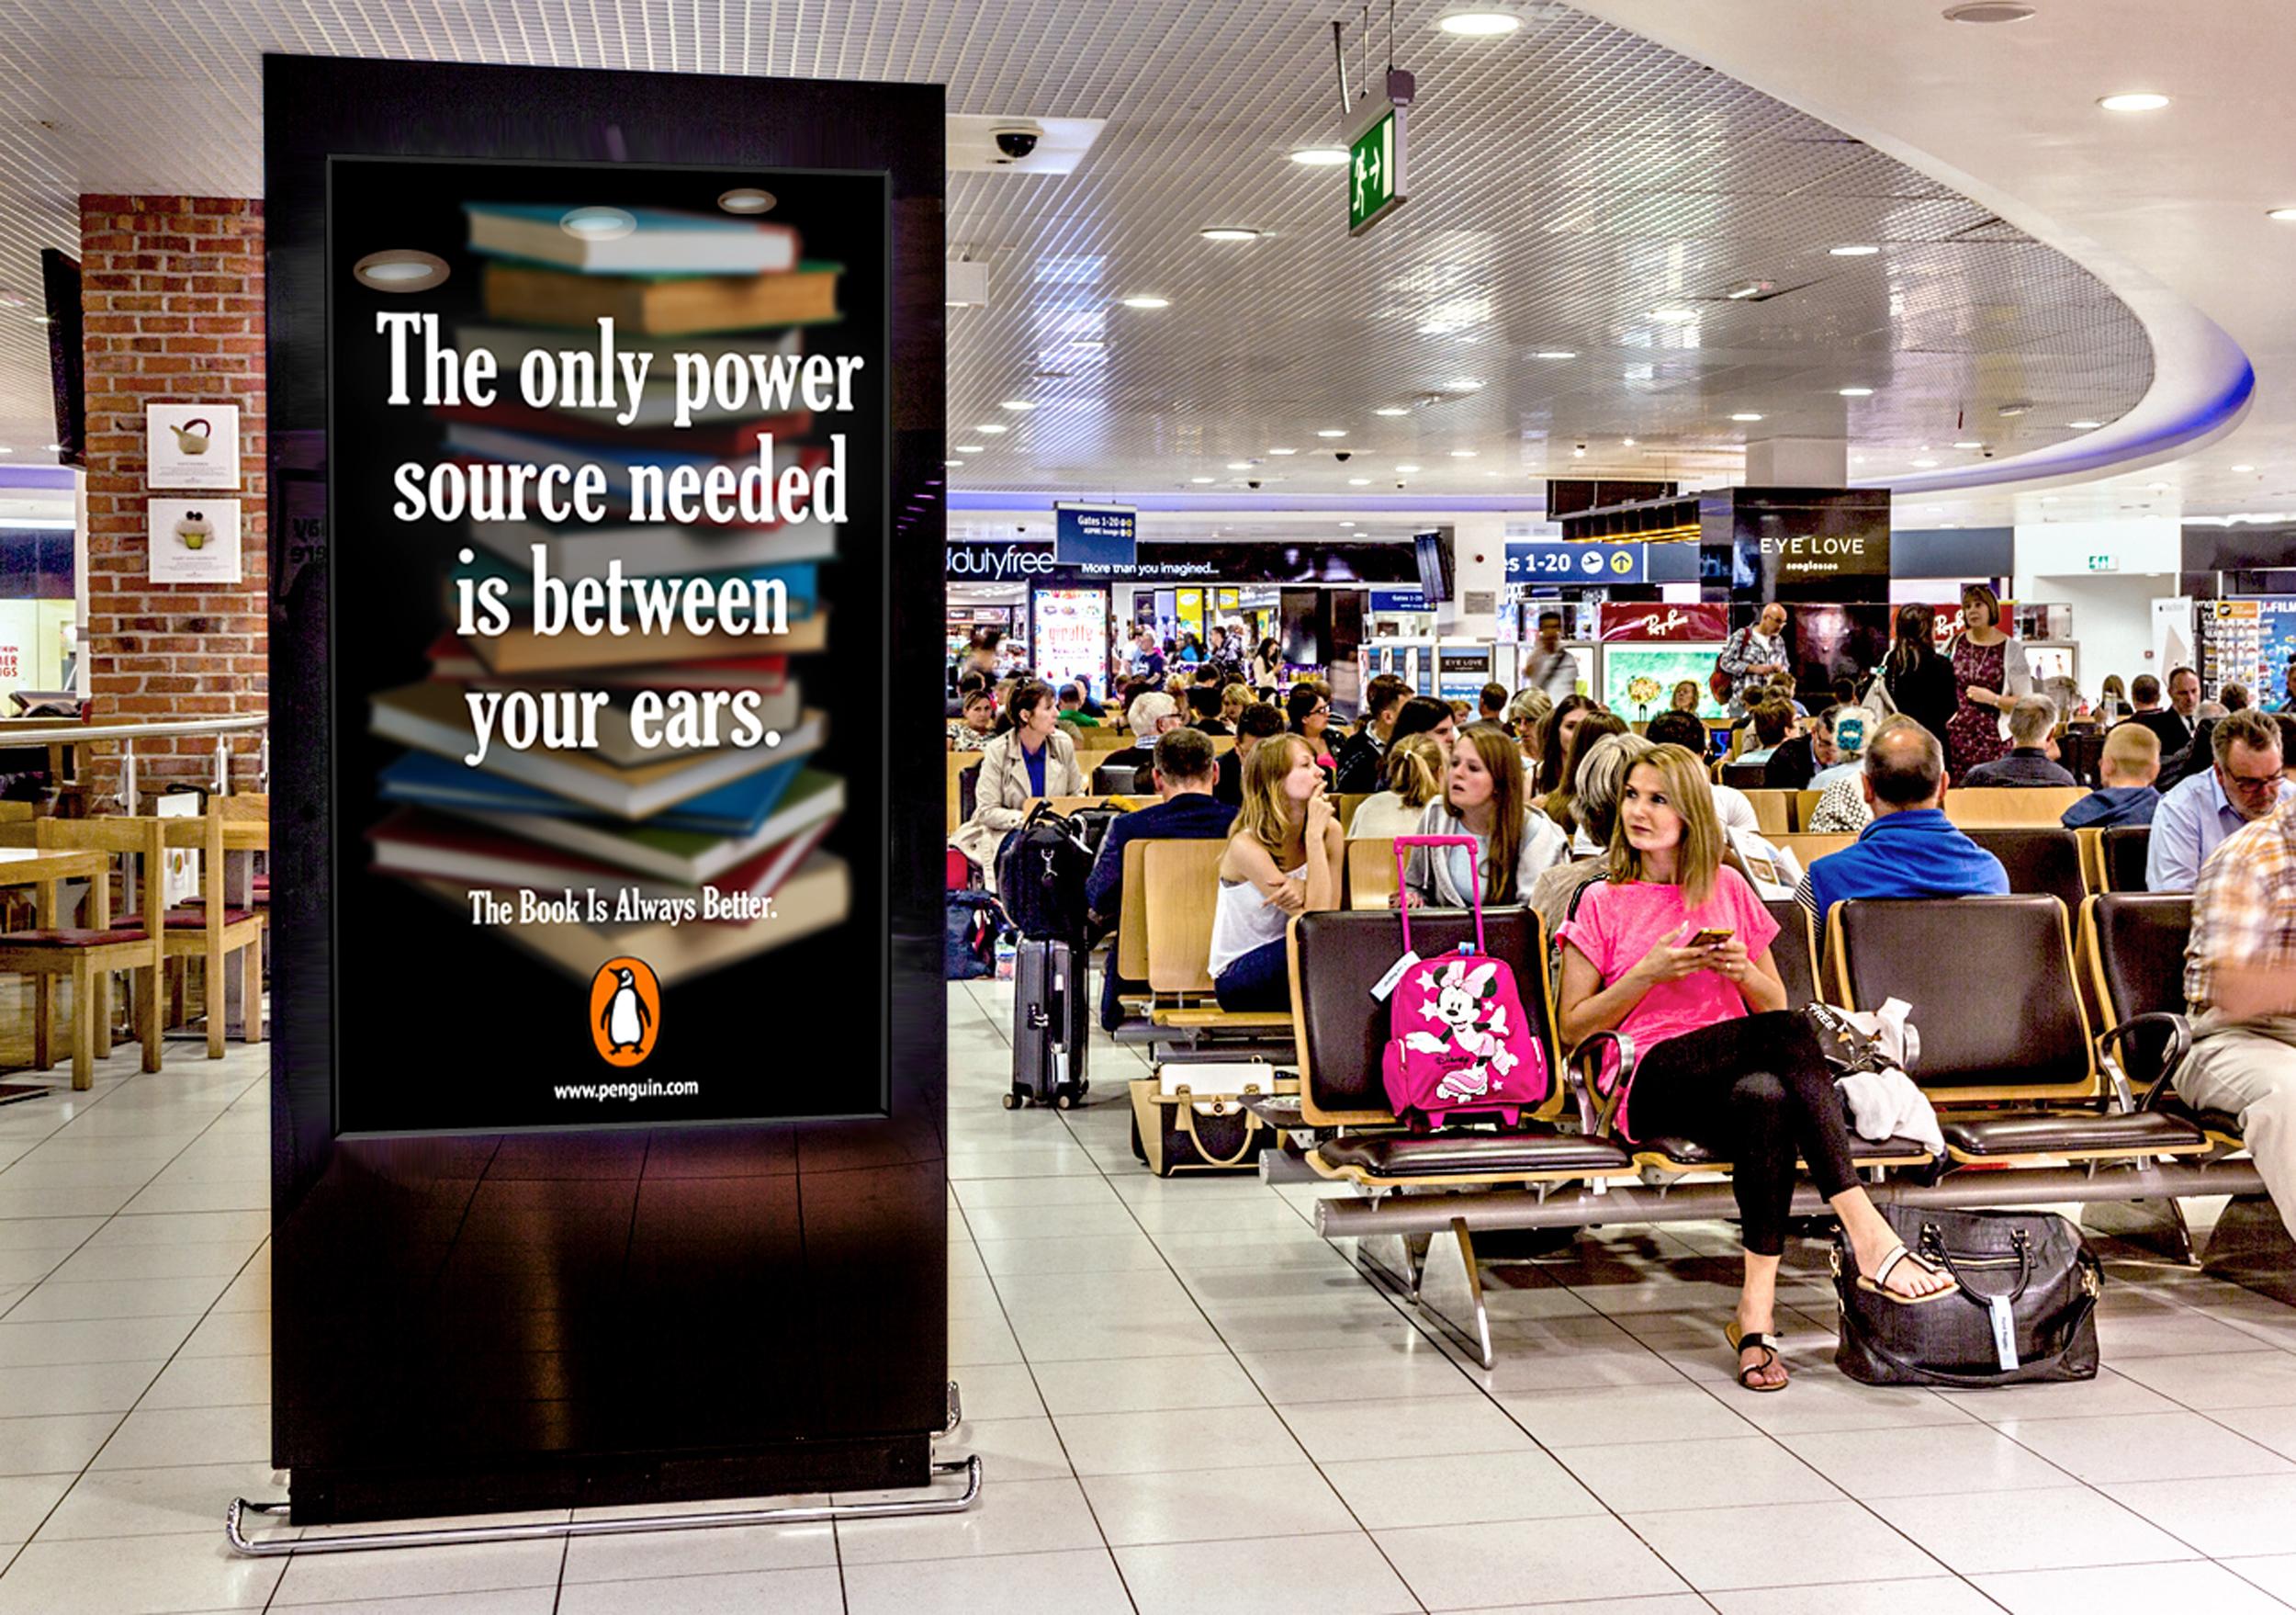 penguin-airport-terminal-300dpi-2500w.jpg